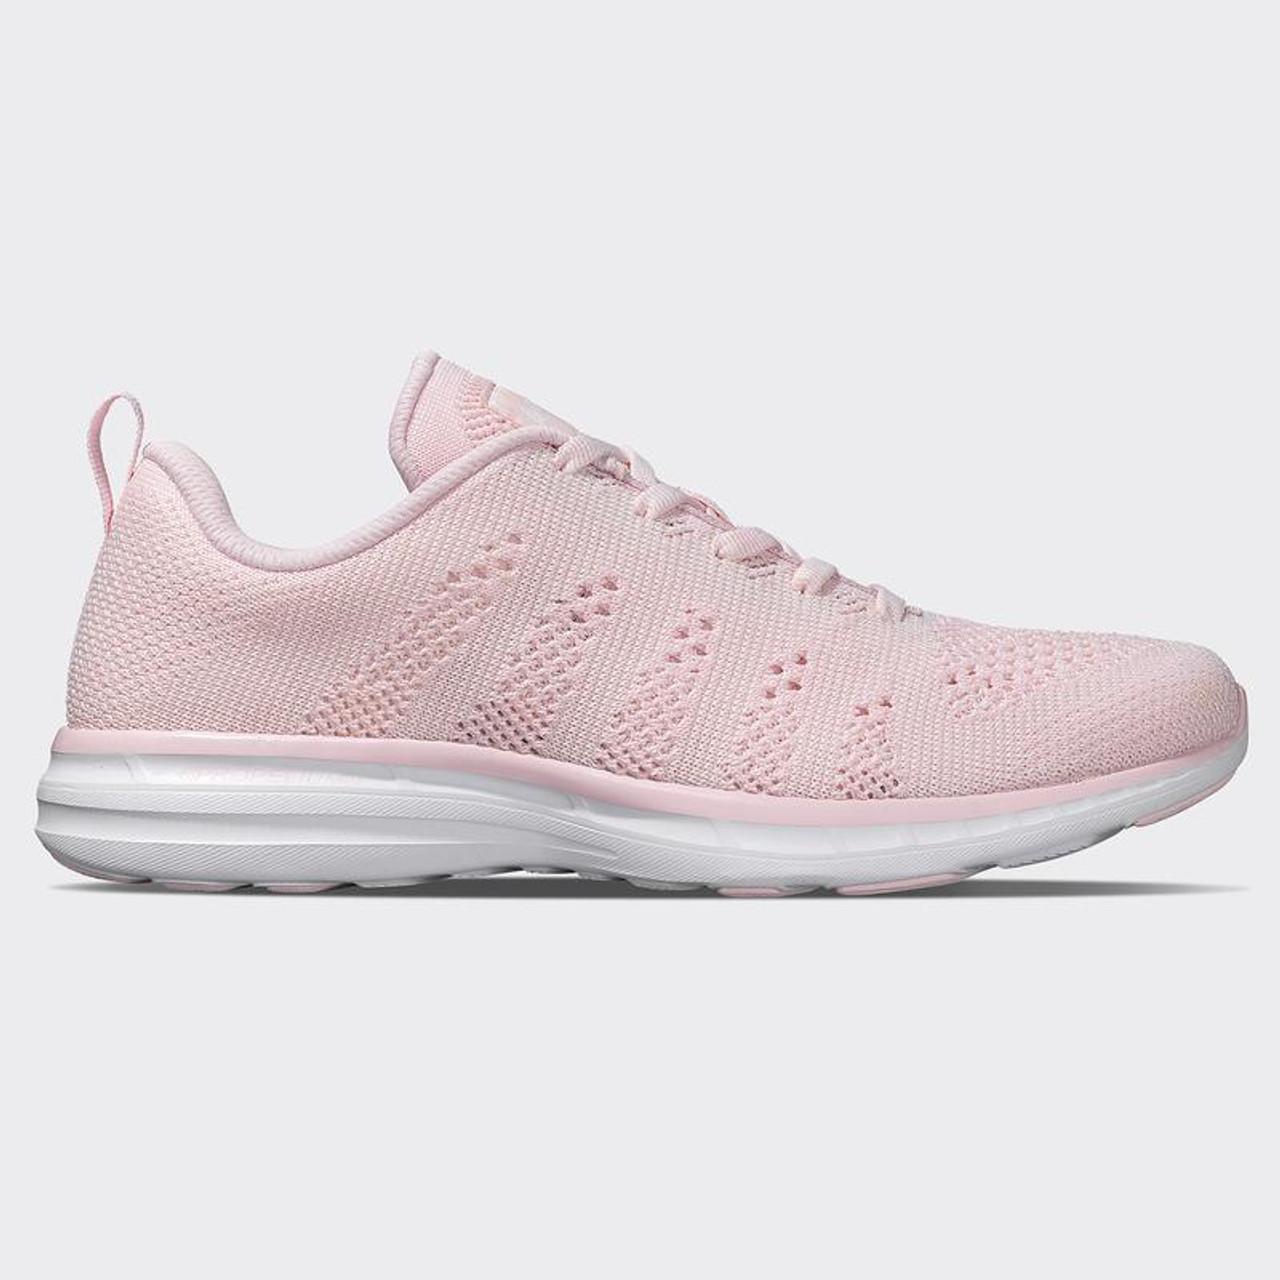 APL Techloom Pro, Bleached Pink